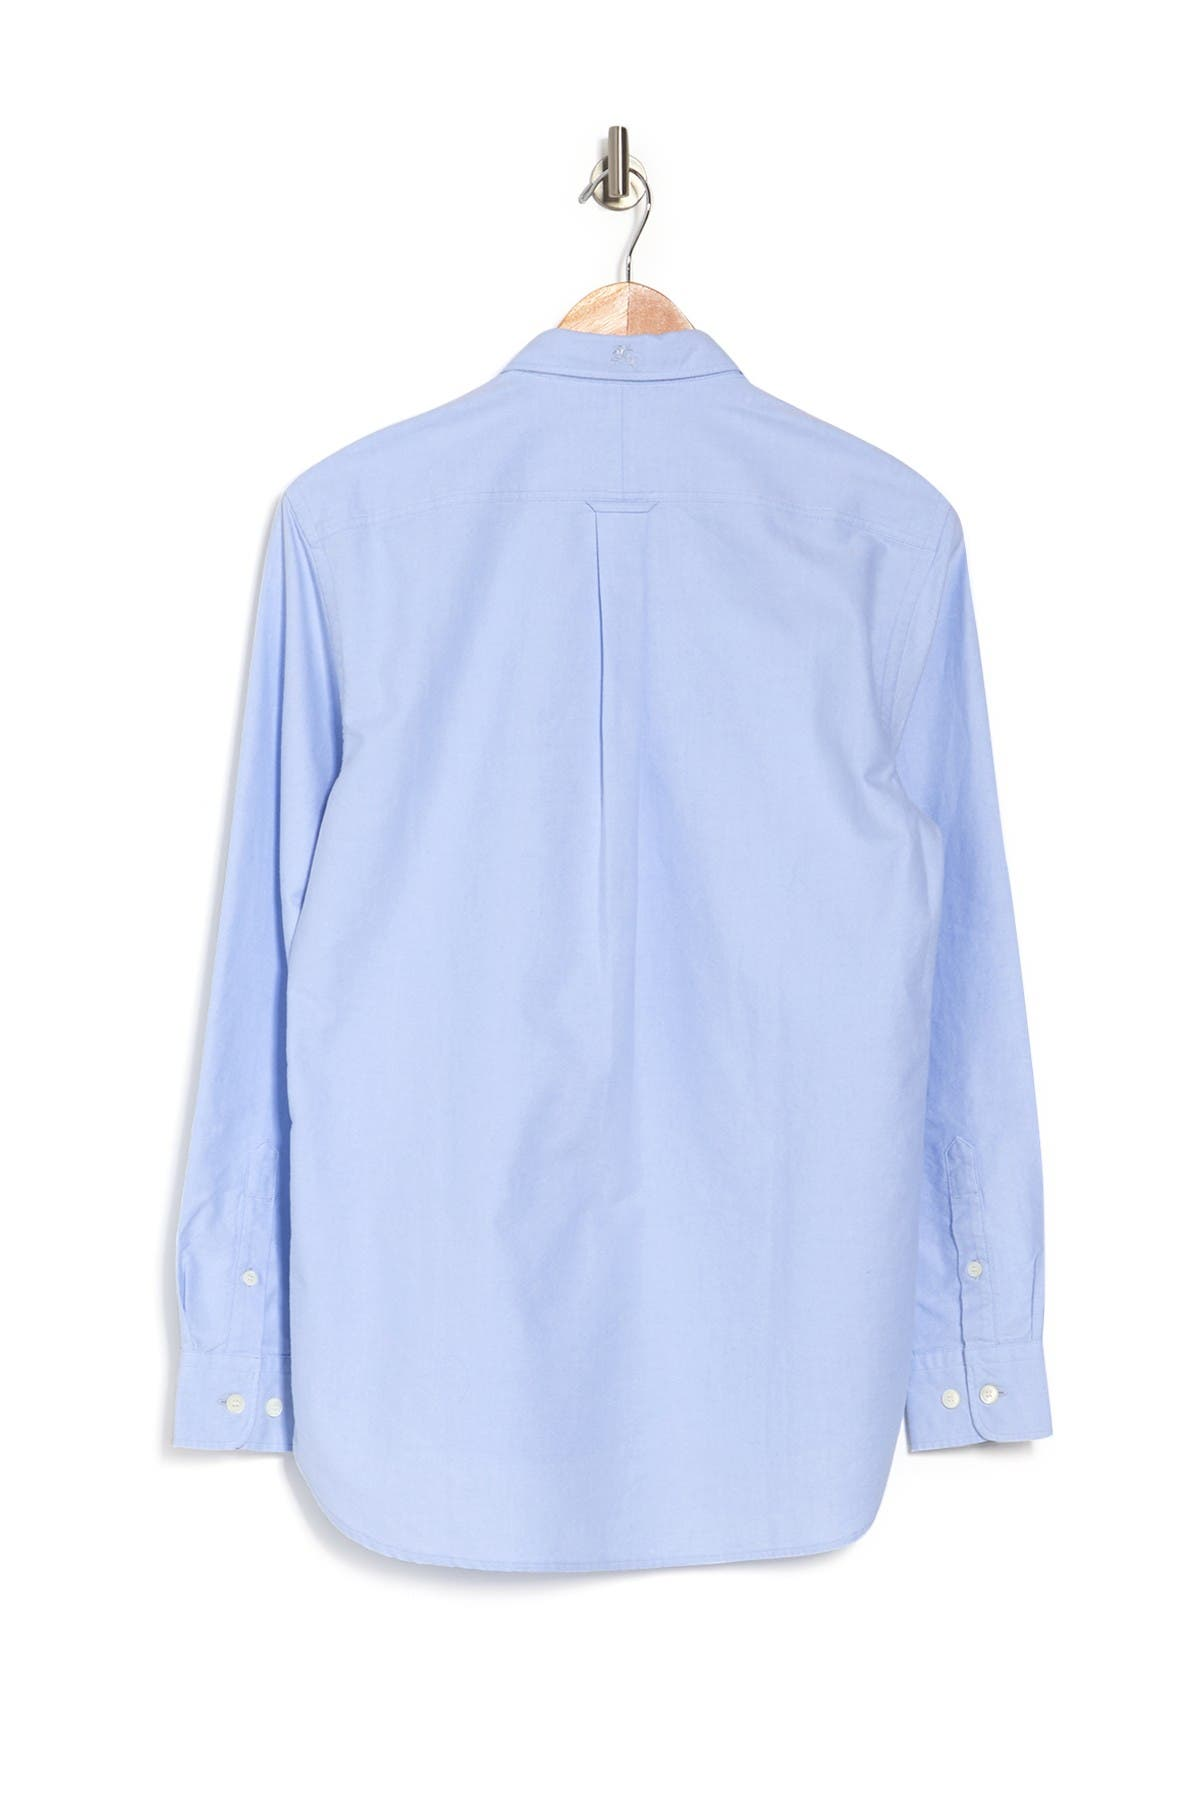 Image of Burberry Harry Button Collar Dress Shirt